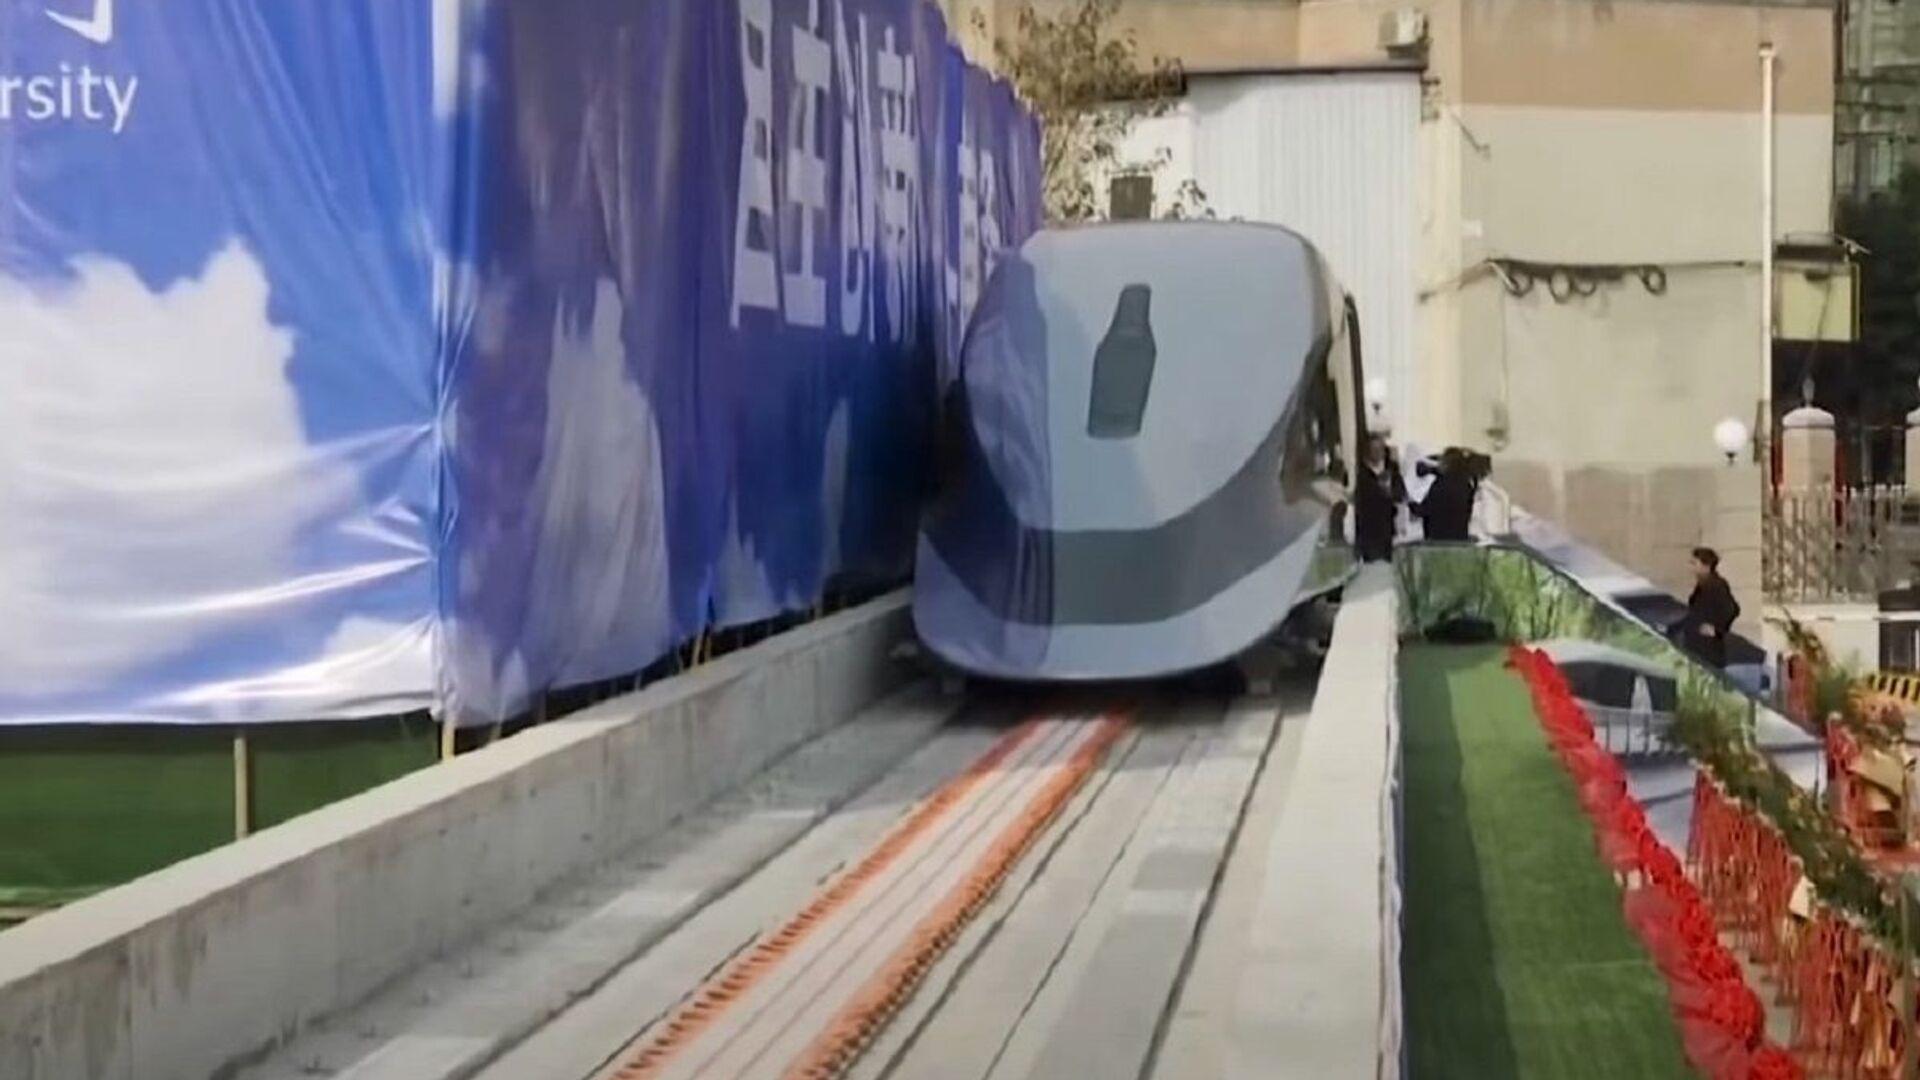 Un treno maglev cinese - Sputnik Italia, 1920, 20.07.2021